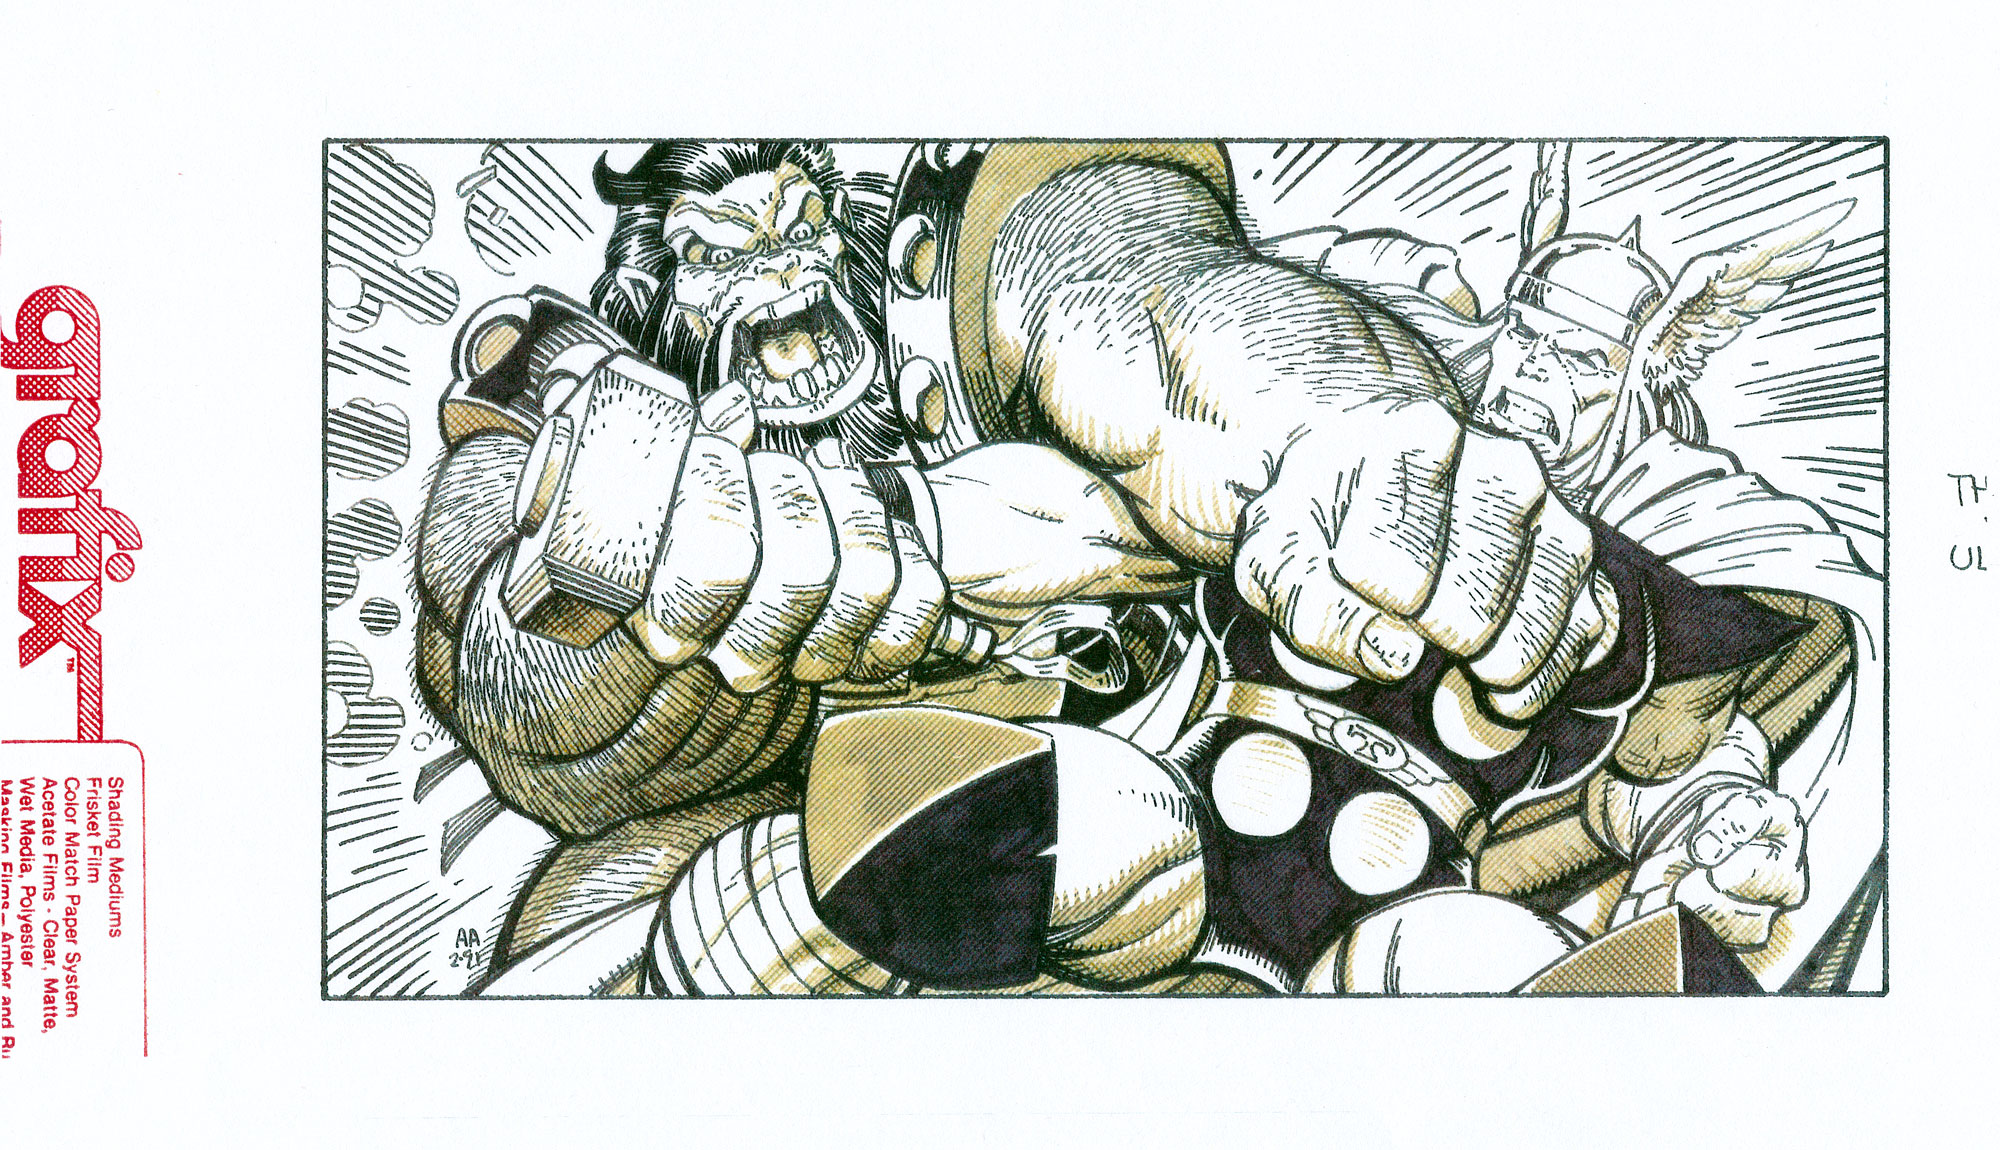 ARTHUR ADAMS 1991 ORIGINAL TRADING CARD ART Comic Art